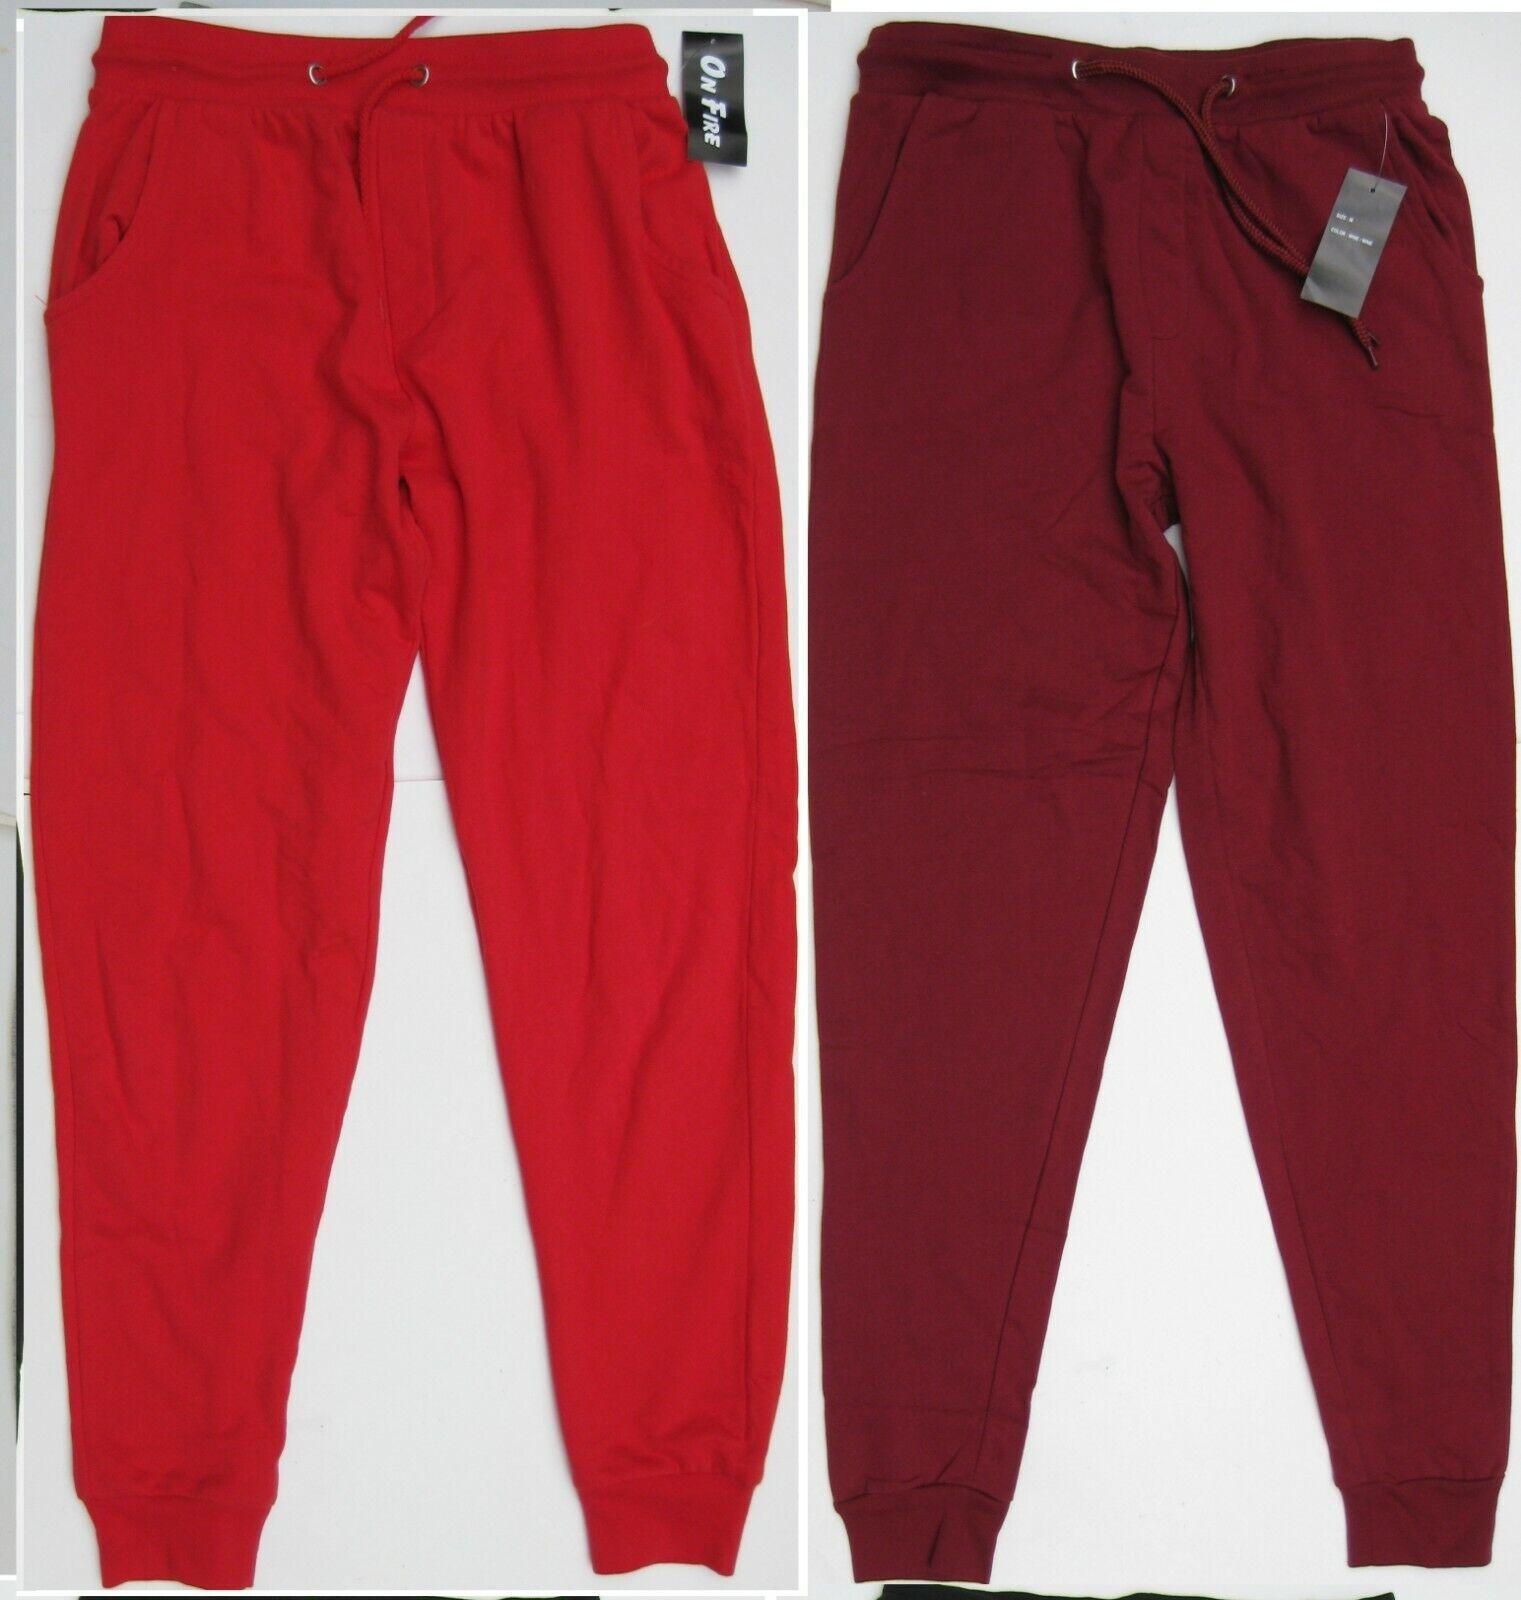 New On Fire 100% Soft Cotton Knit Fleece Jogger Pants Cuffed